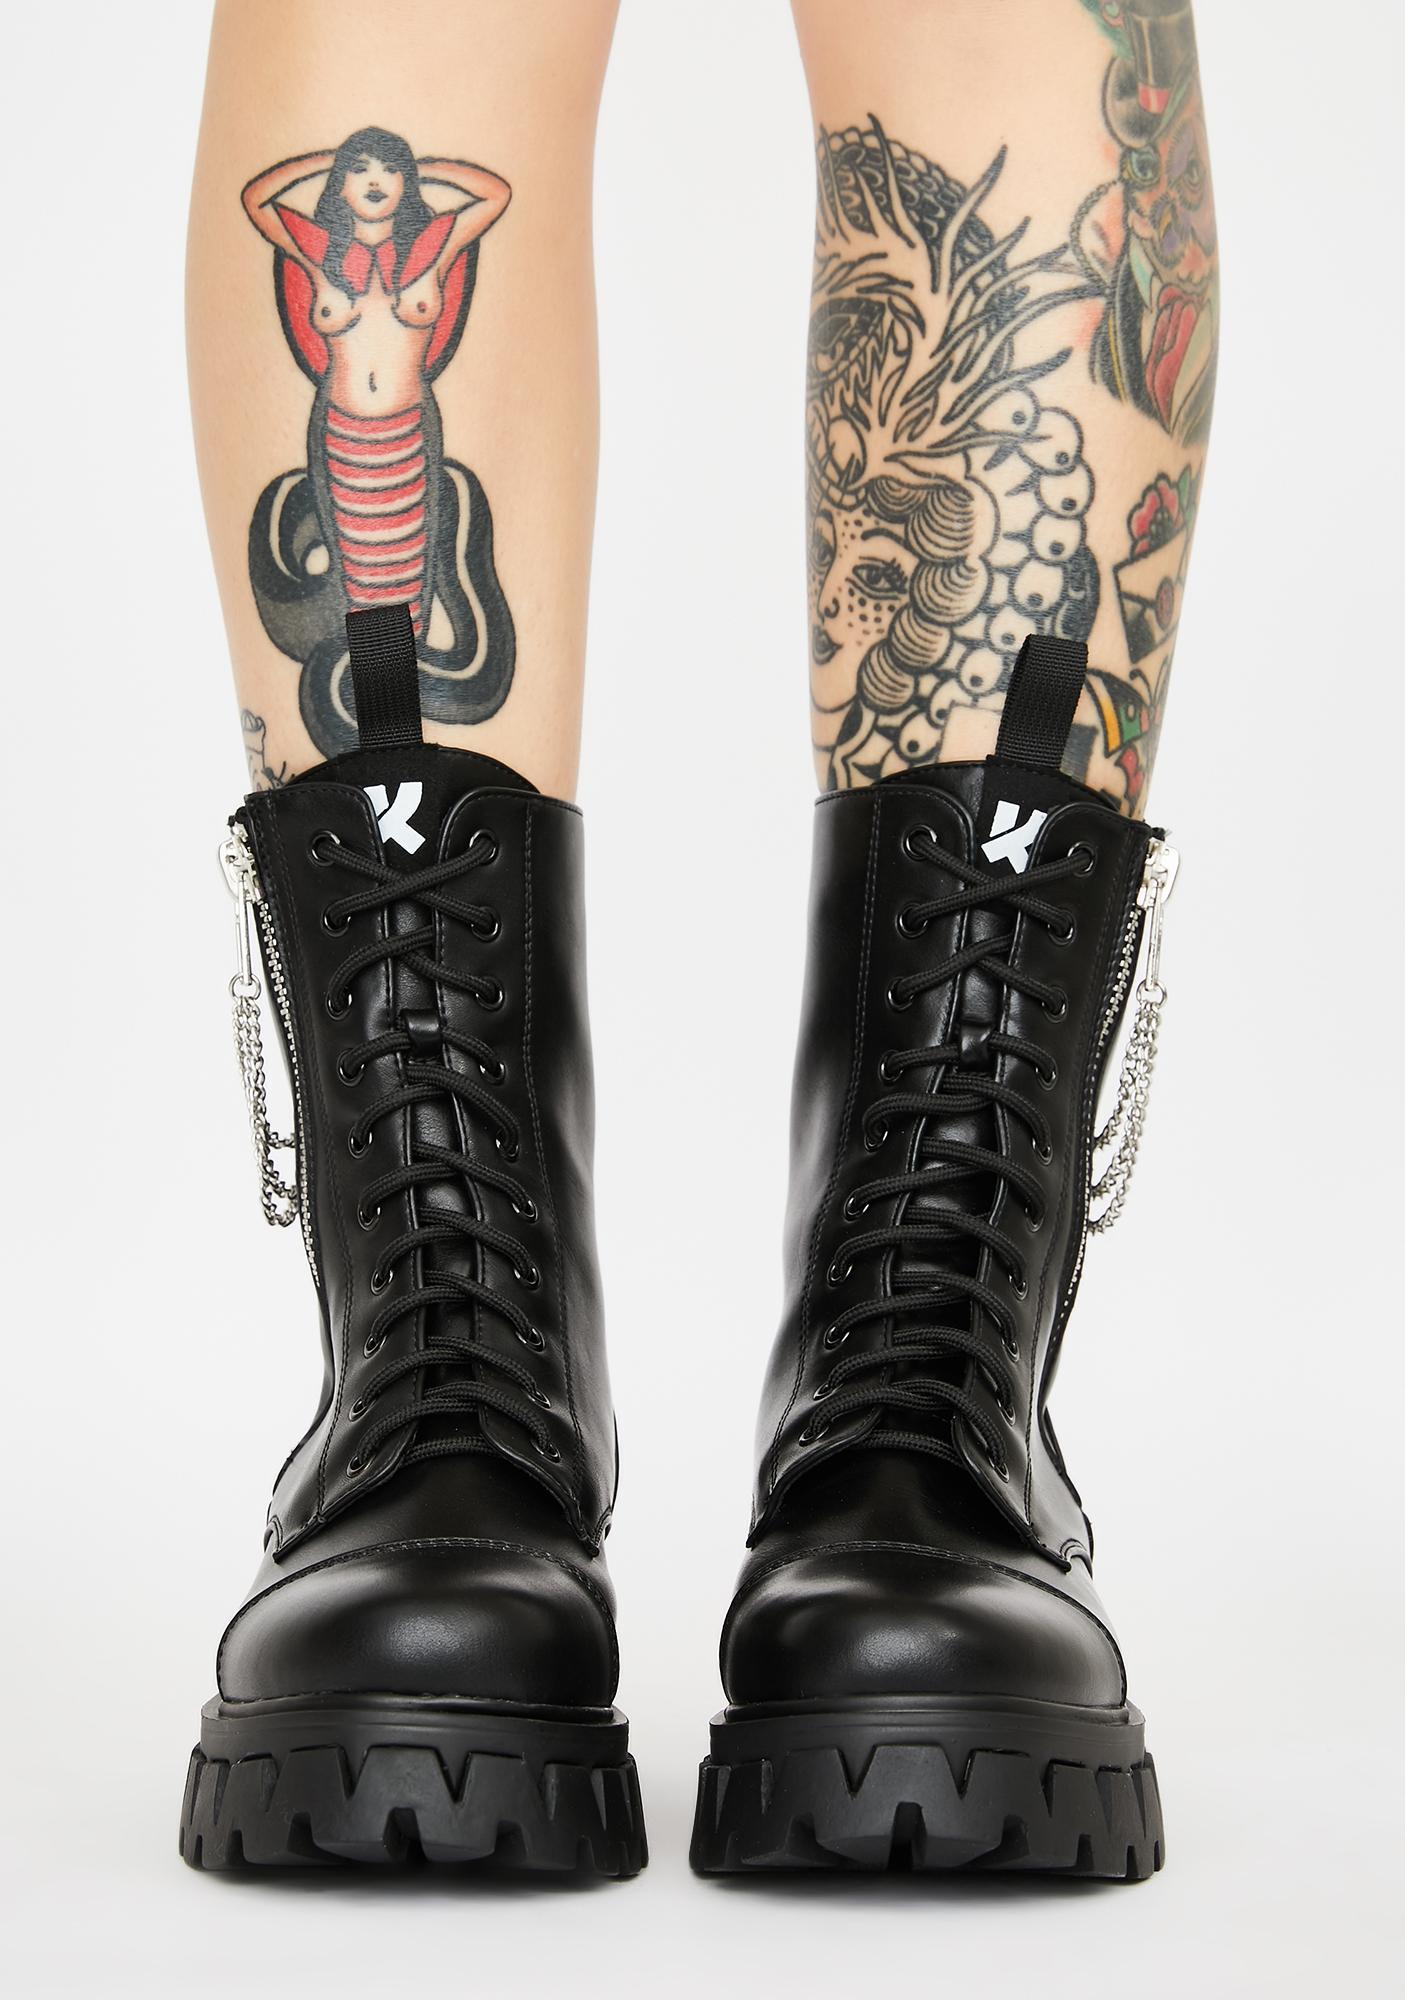 Koi Footwear Mergo Chain Combat Boots